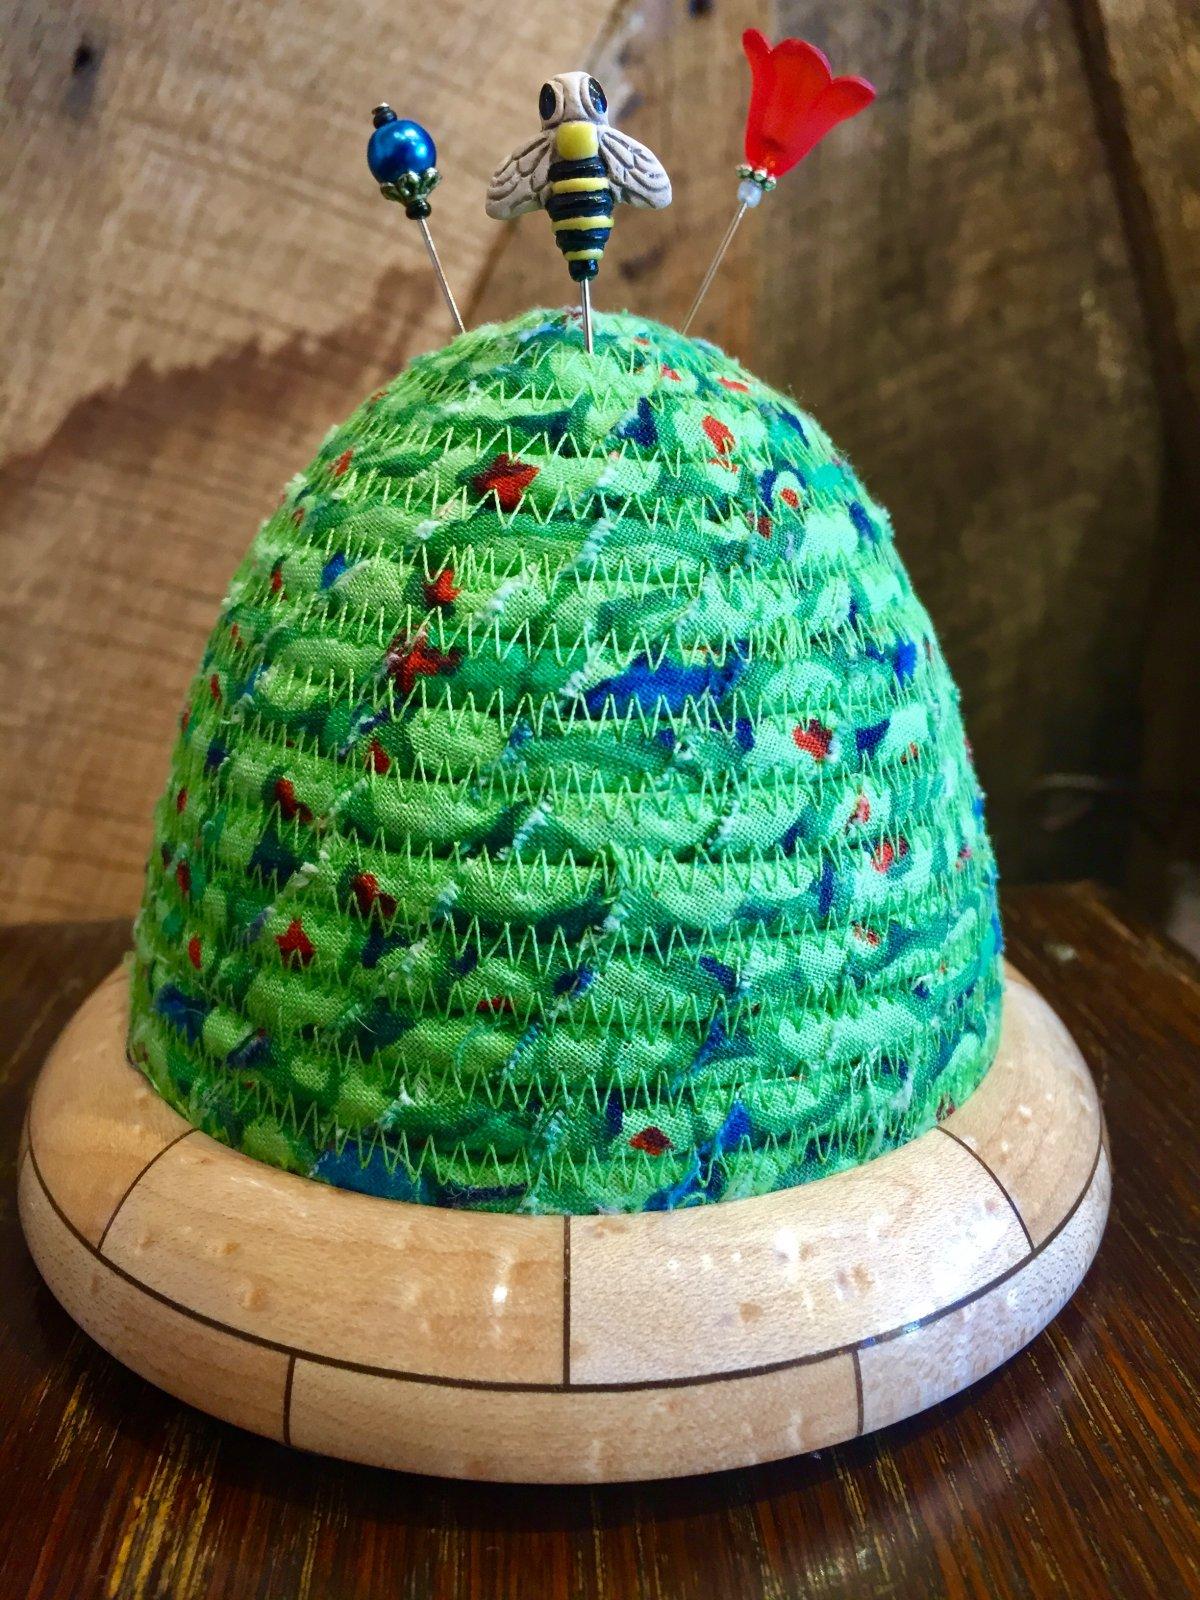 Beehive Pincushion - Kaffe Fassett Button Mosaic - Green Top - Birdseye Maple / Walnut Base